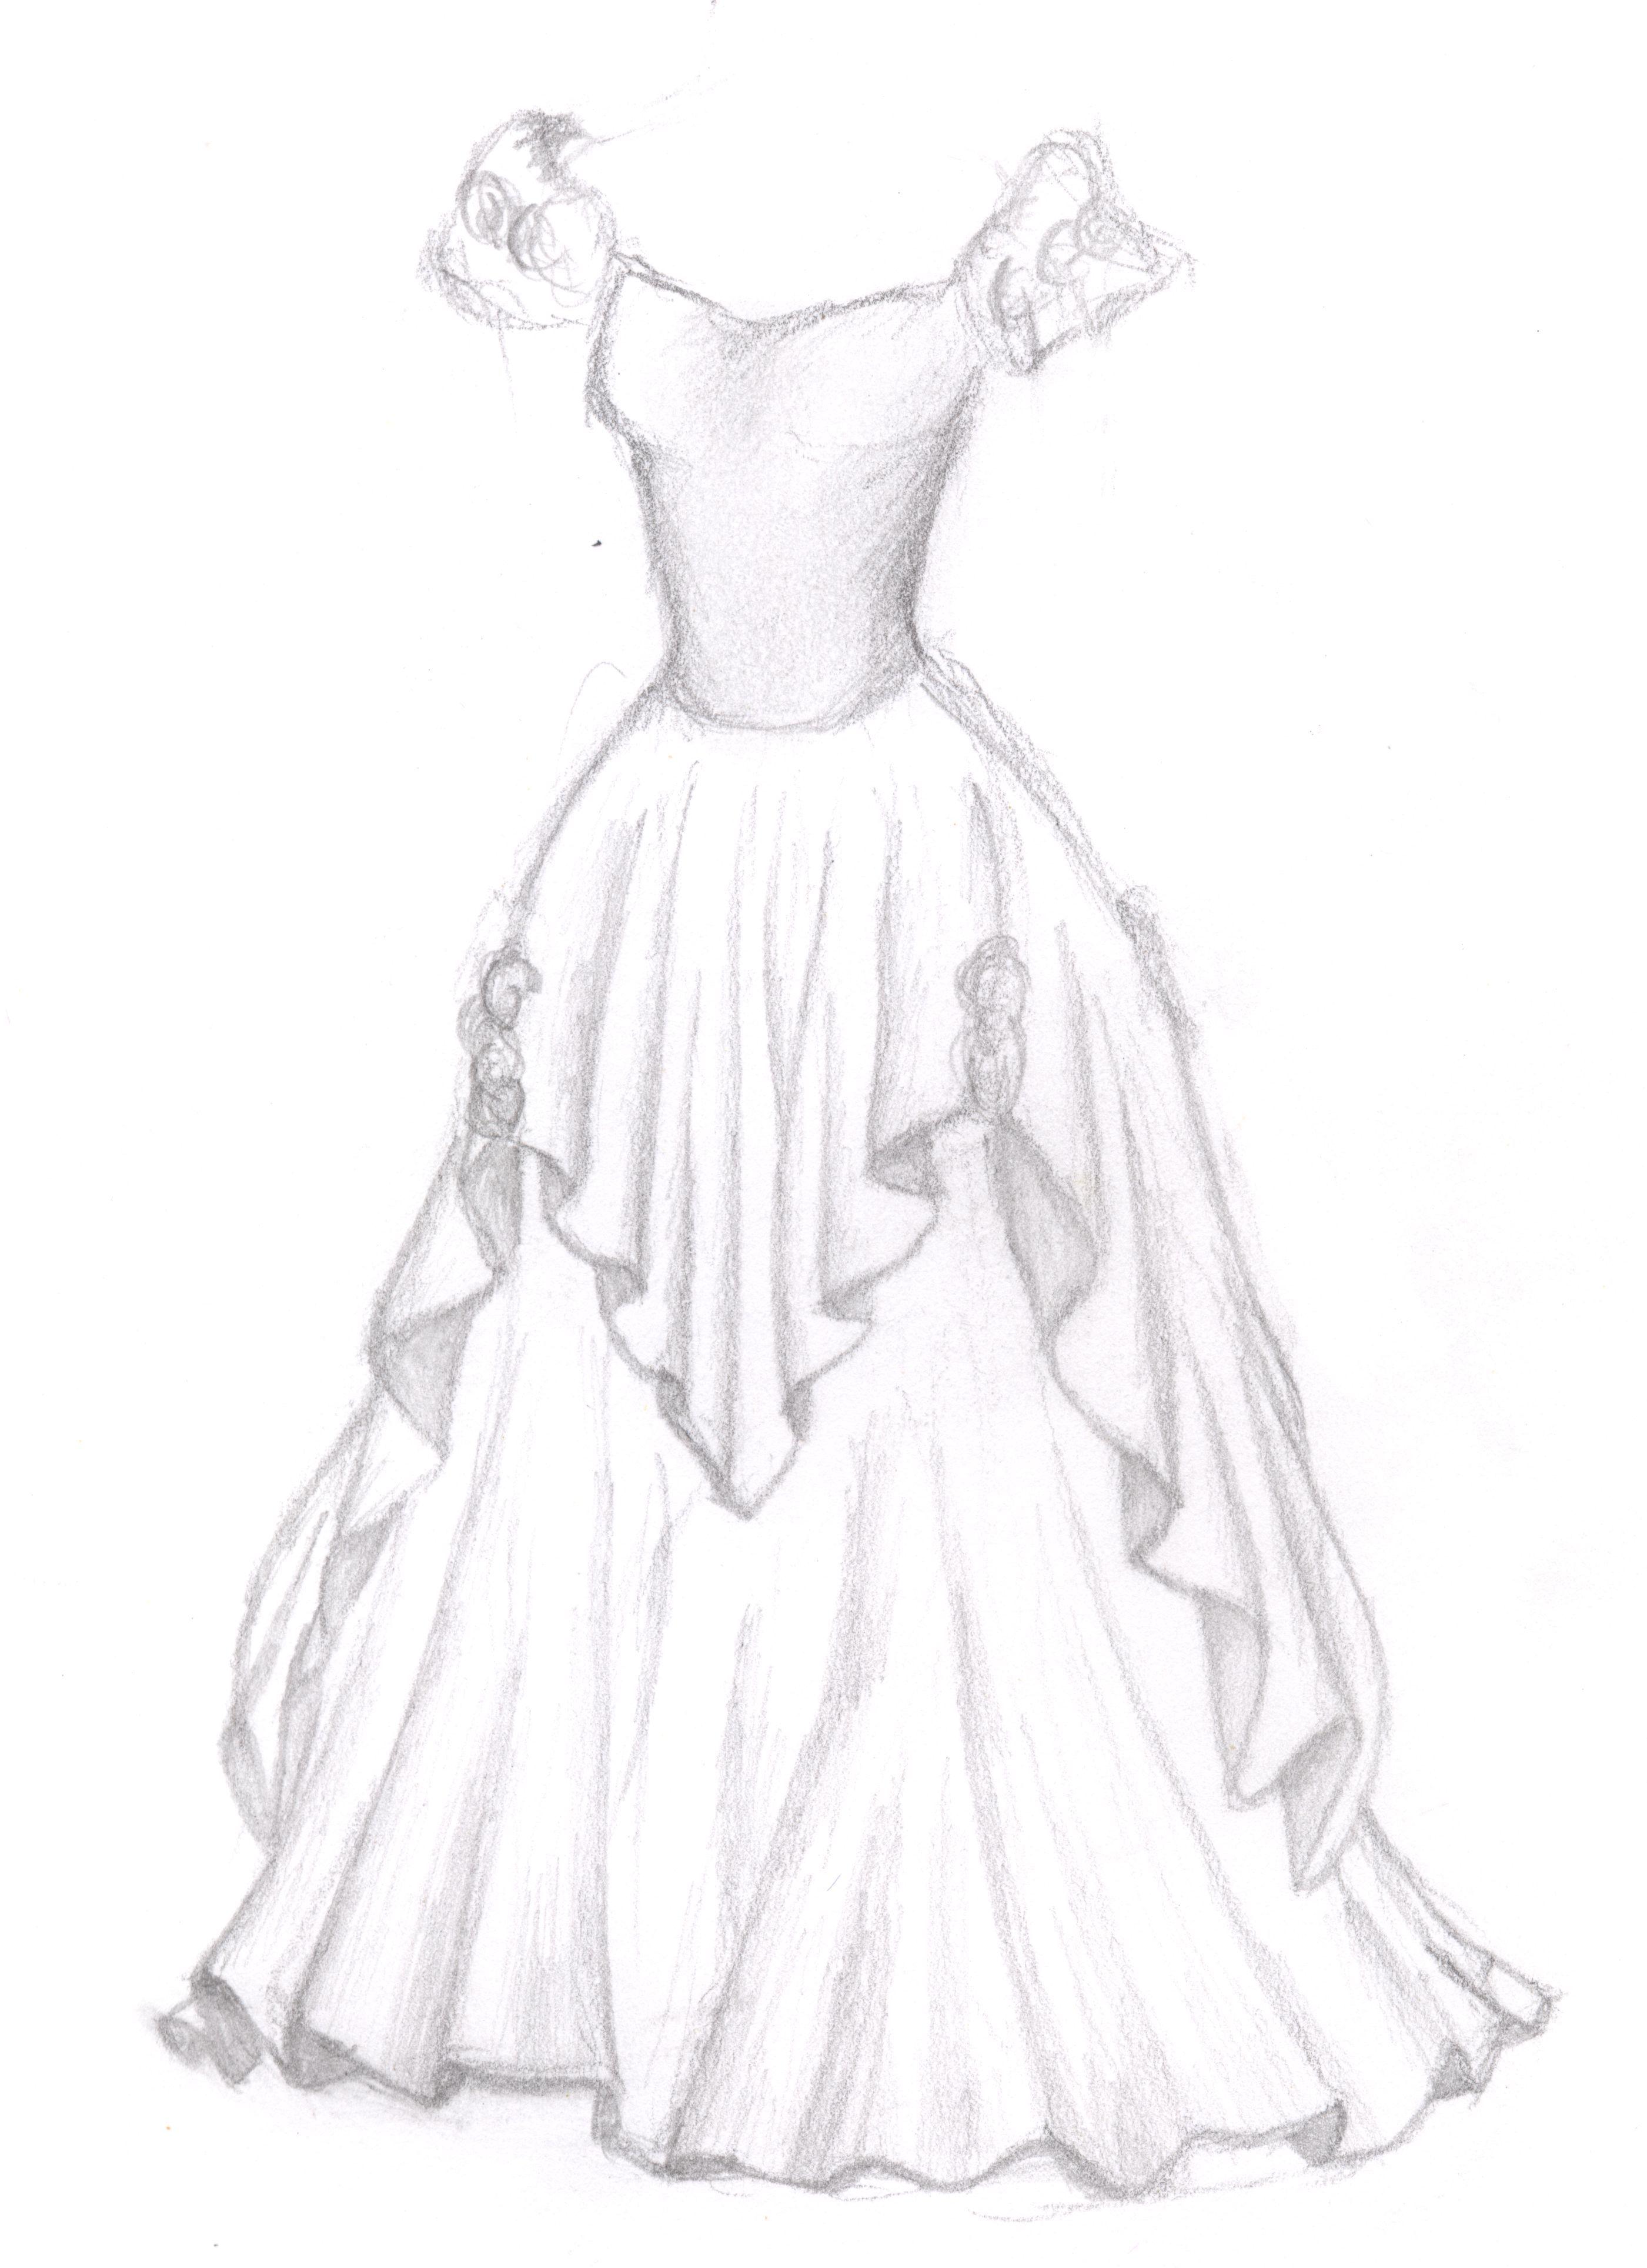 A dress by sarah tesh 2008 dress design sketches wedding dress sketches